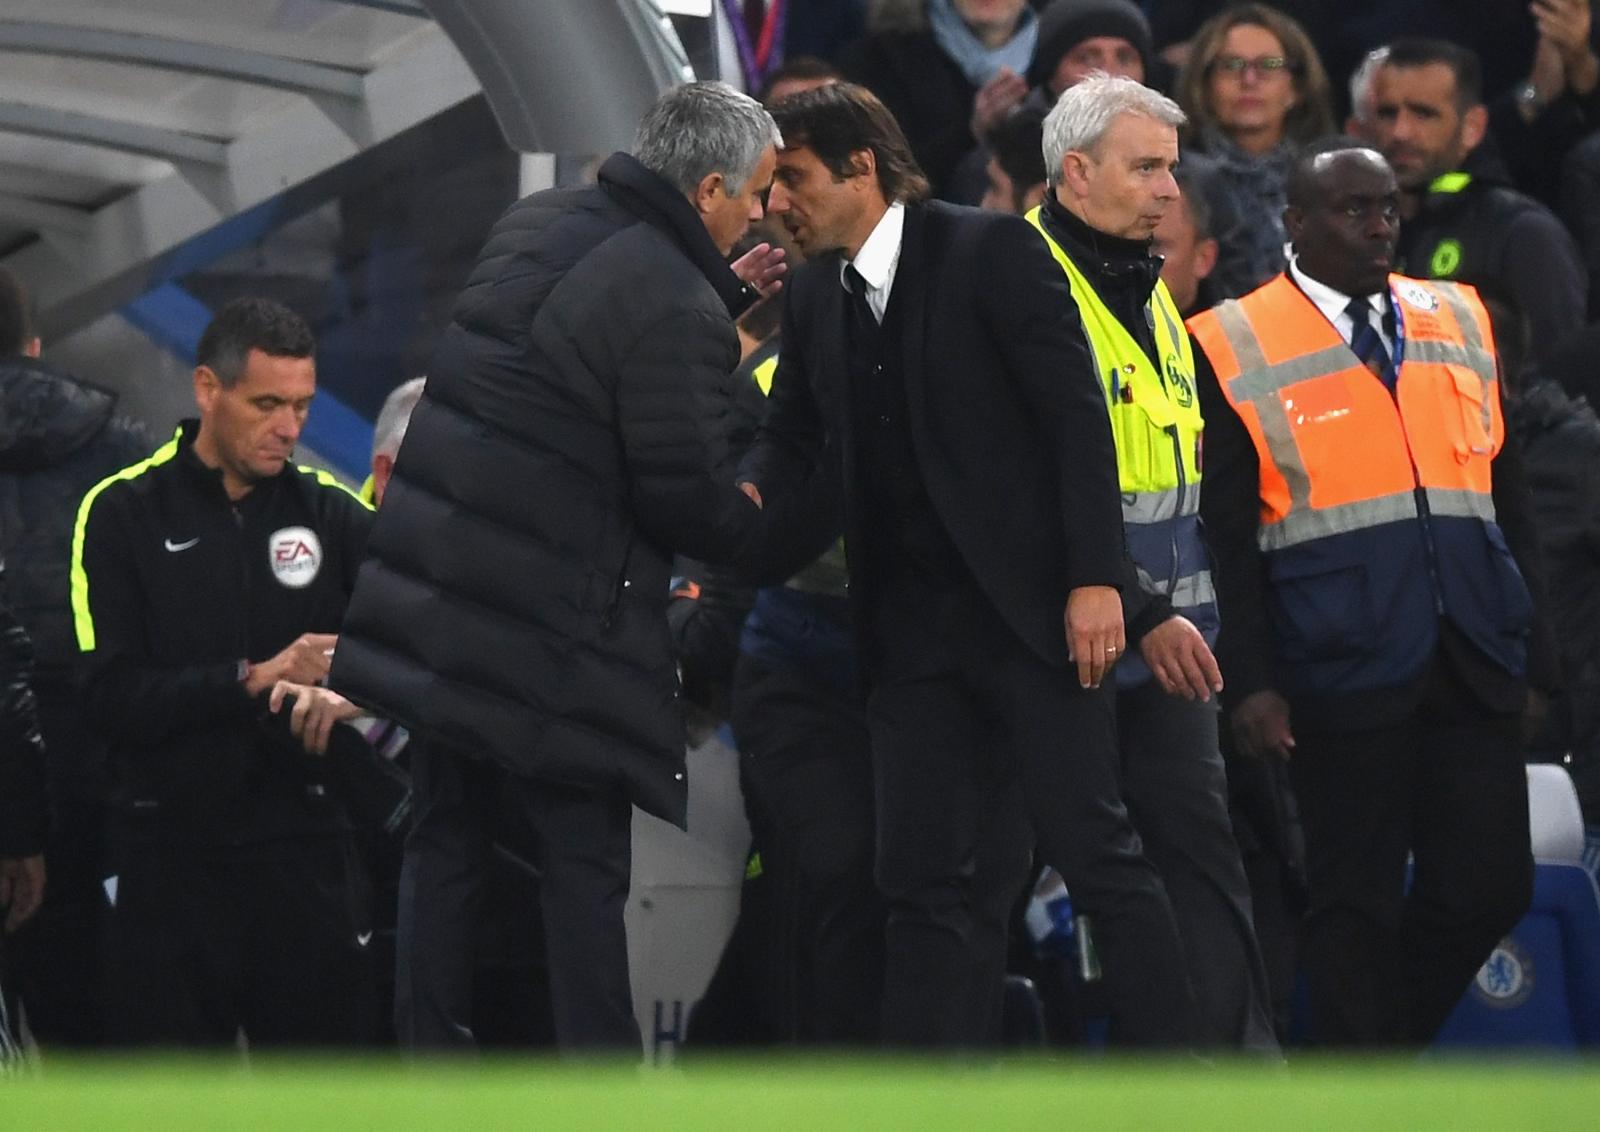 Jose Mourinho (left) and Antonio Conte